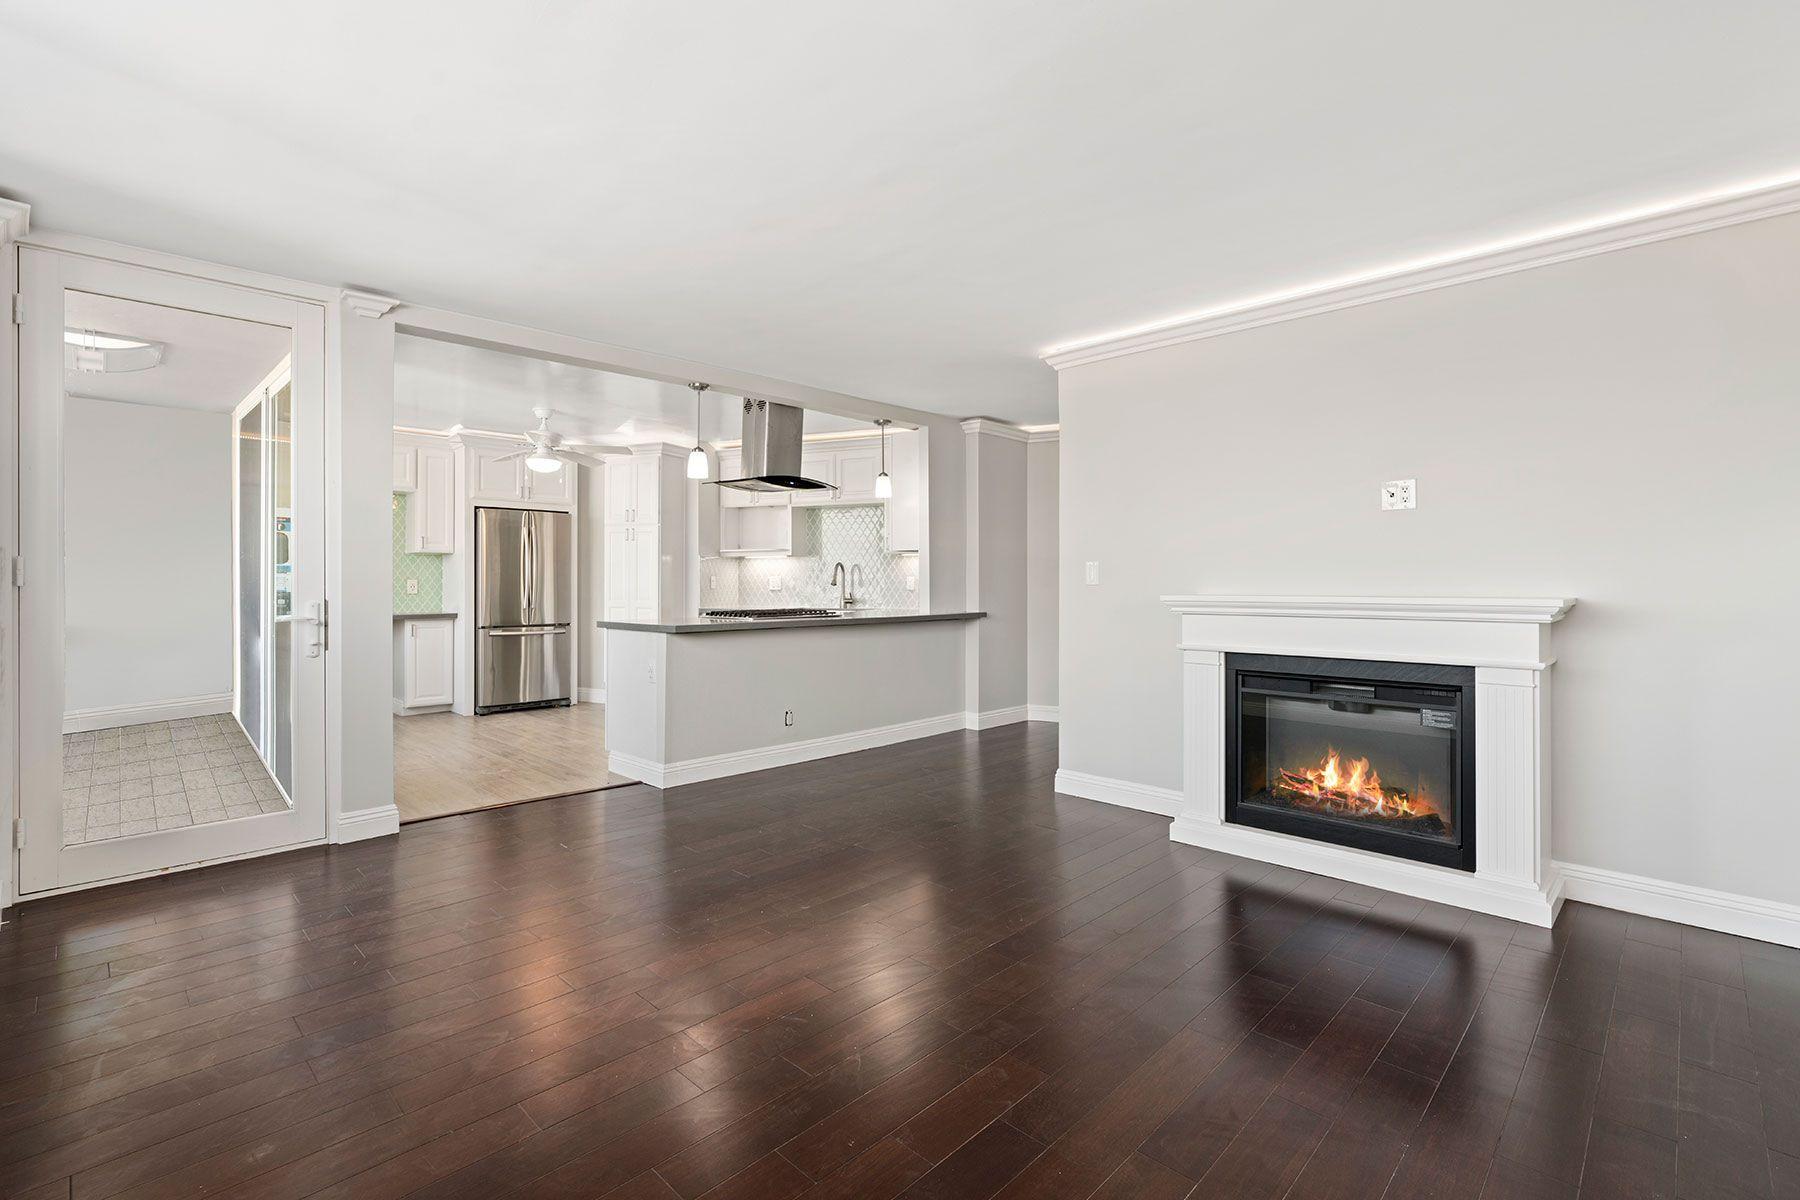 Condominium for Rent at 310 Fernando 310 Fernando APT. 303, Newport Beach, California, 92661 United States